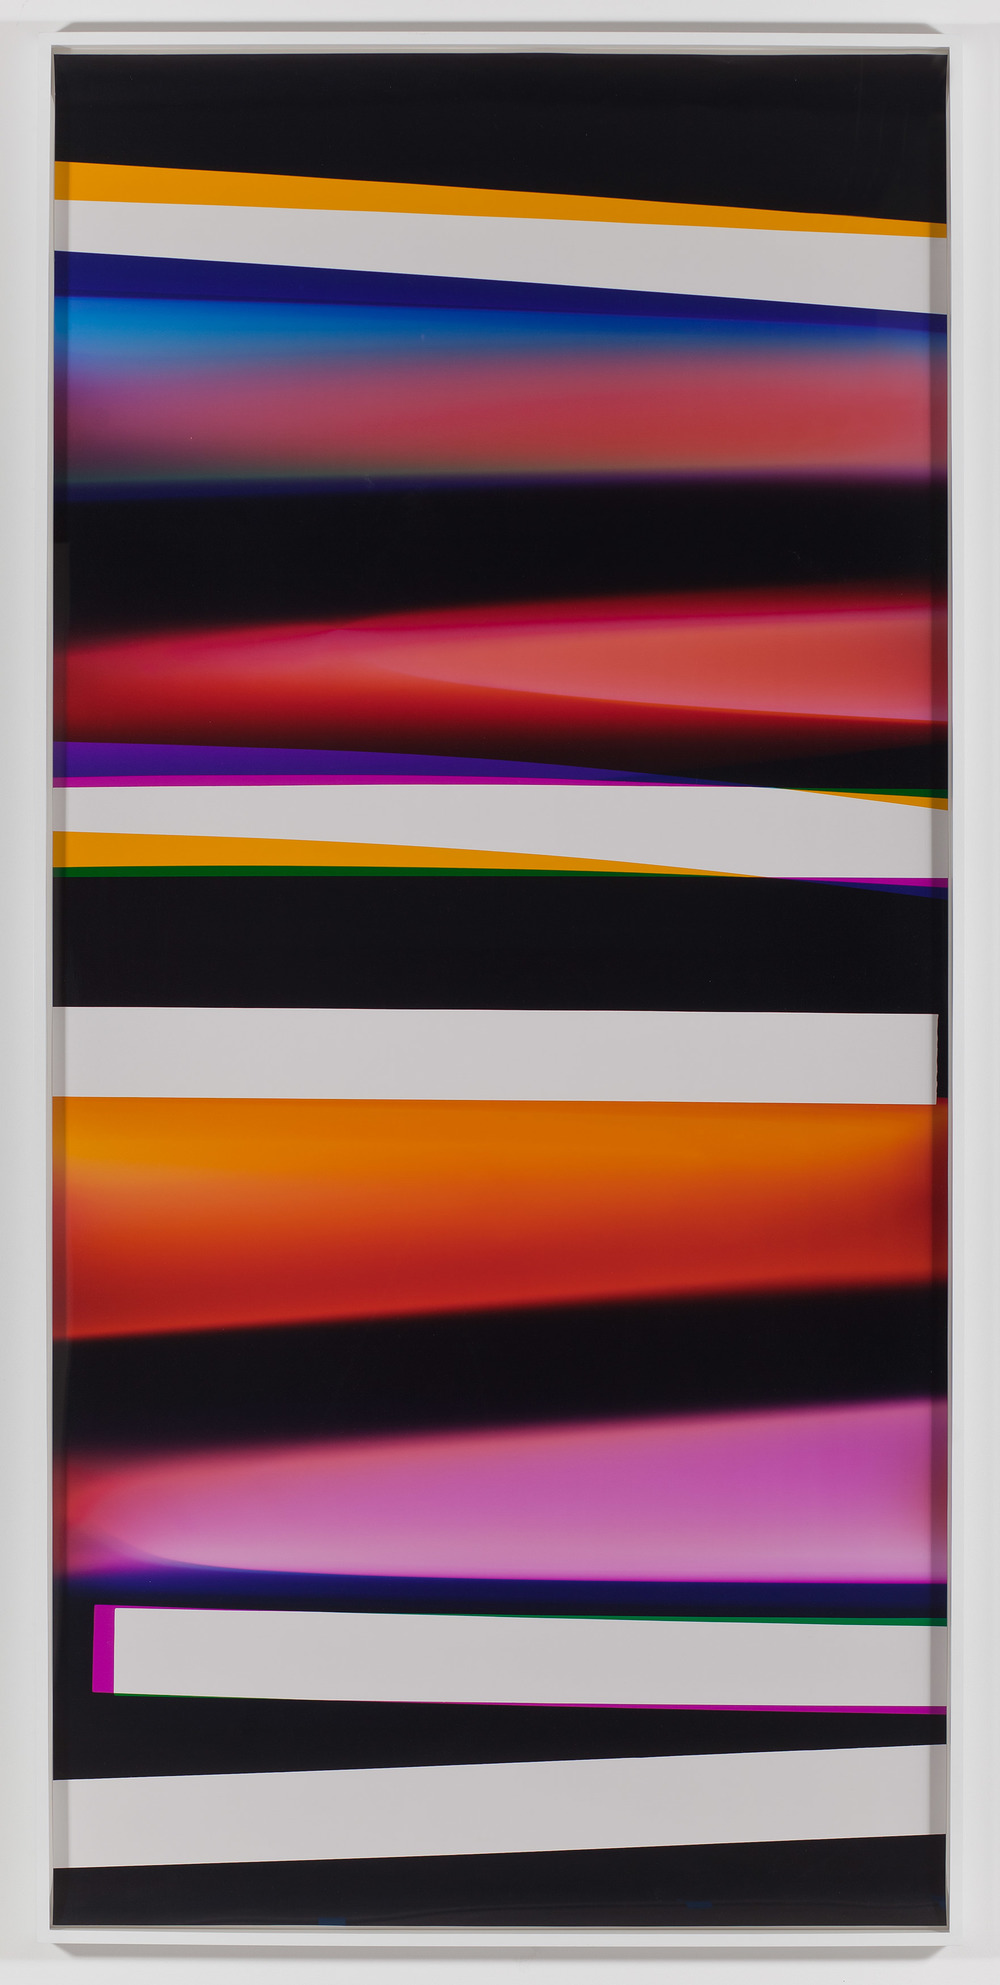 Walead Beshty: Natural Histories, Walead Beshty and Lionel Bovier eds. (Zurich: JRP Ringier, 2011) pp. 126–127    2011   Light jet print in custom plexi box  108 1/2 x 51 1/2 x 7 inches   Black Curls, 2010–2013